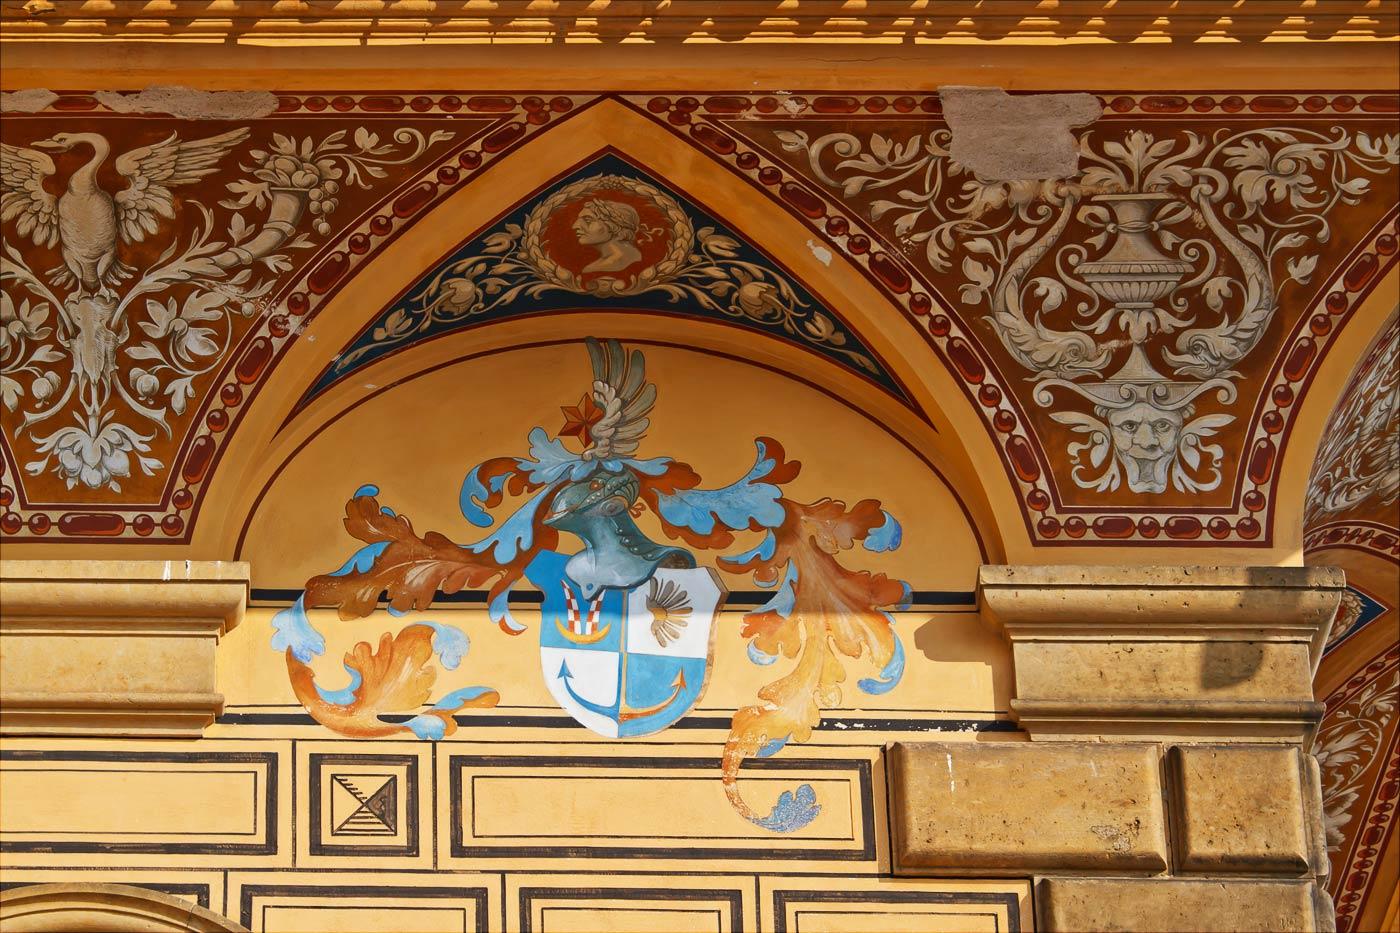 Дворец Пругонице, роспись на стенах внутреннего дворика